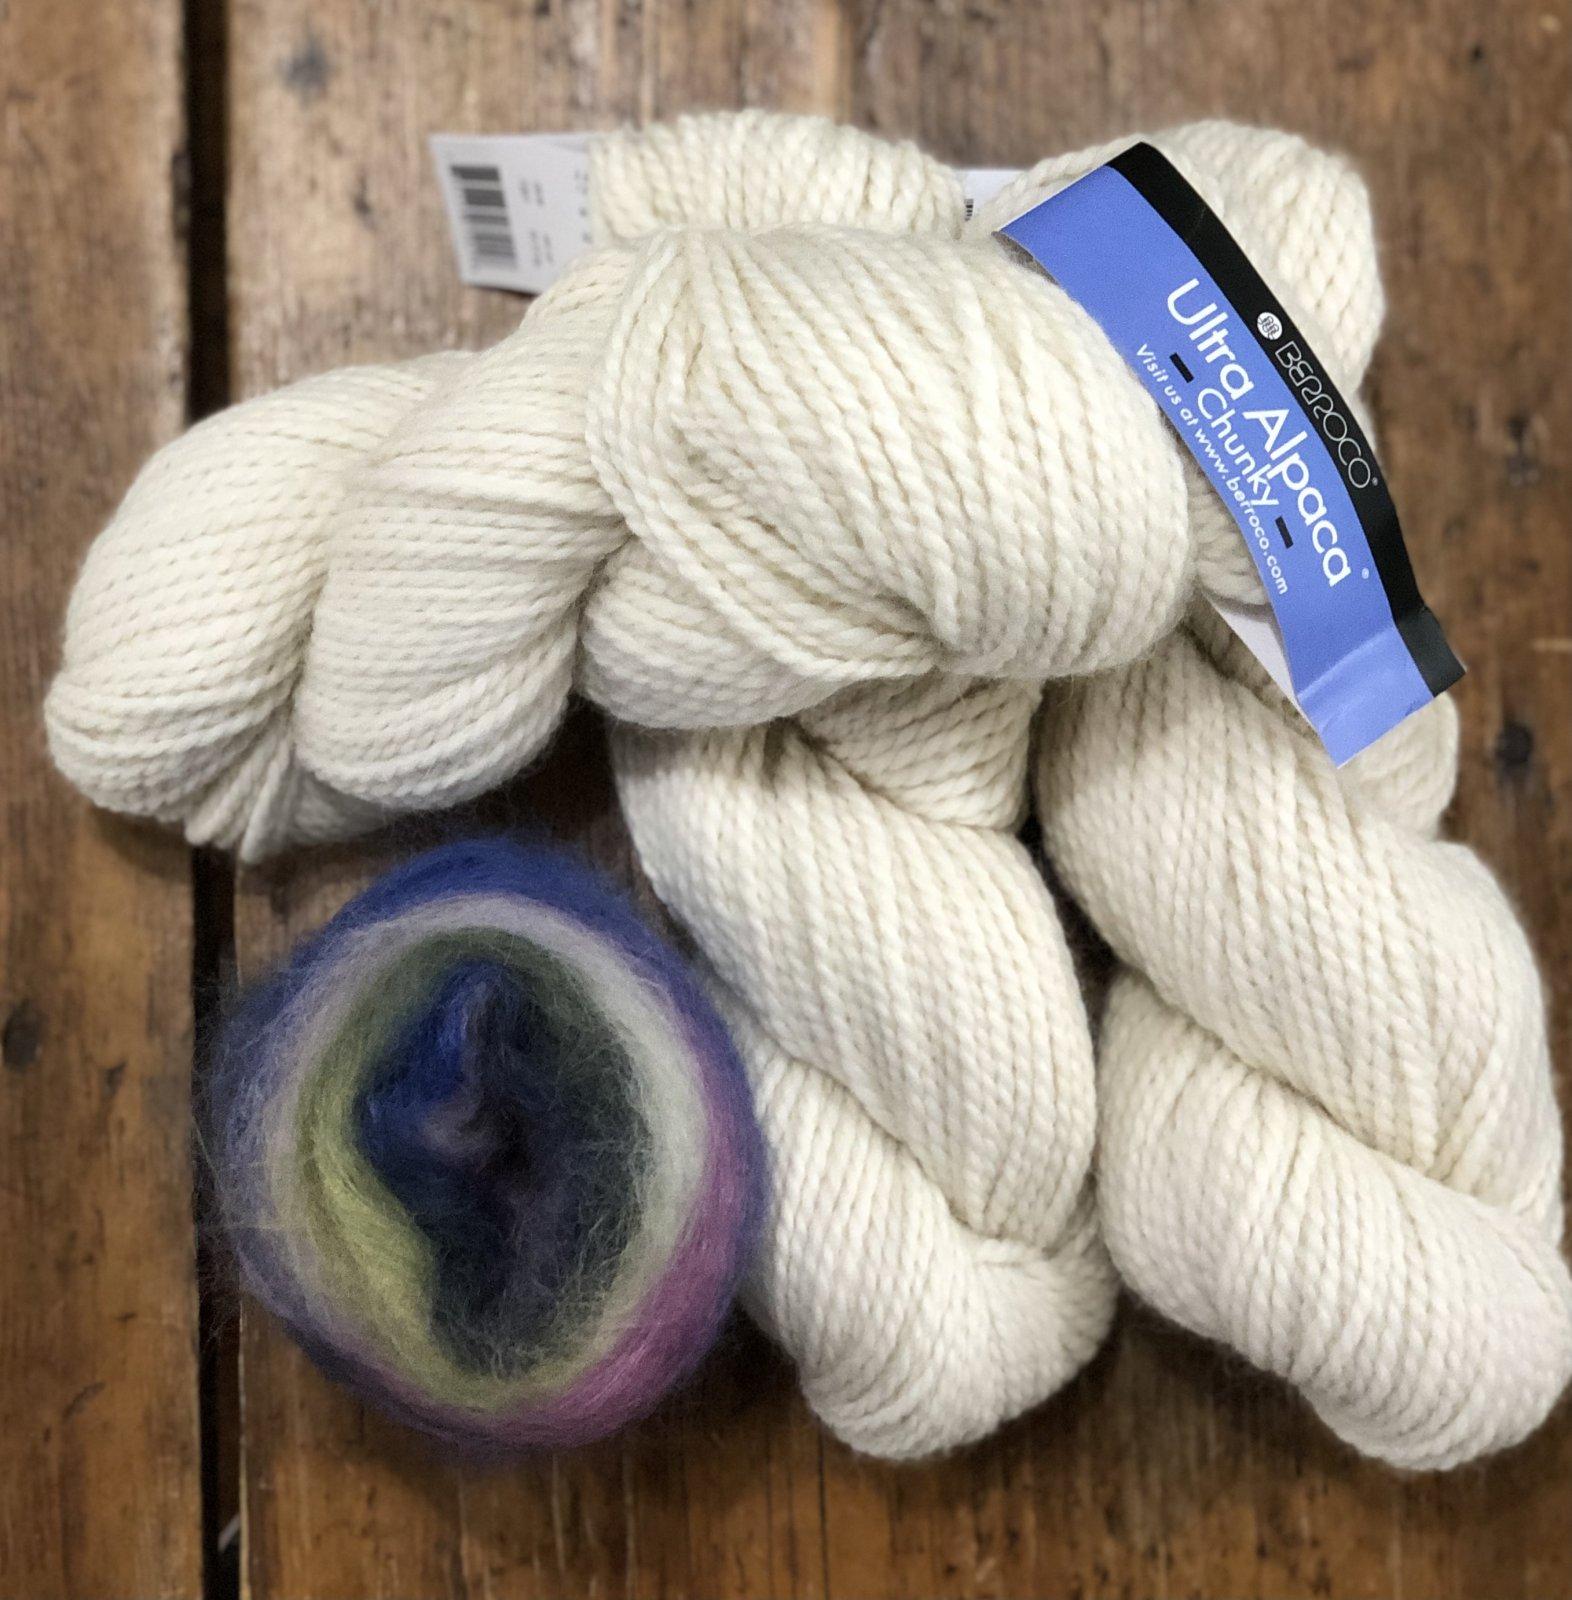 Knit Look Shoulder Cozy Kit (white/blue/green)